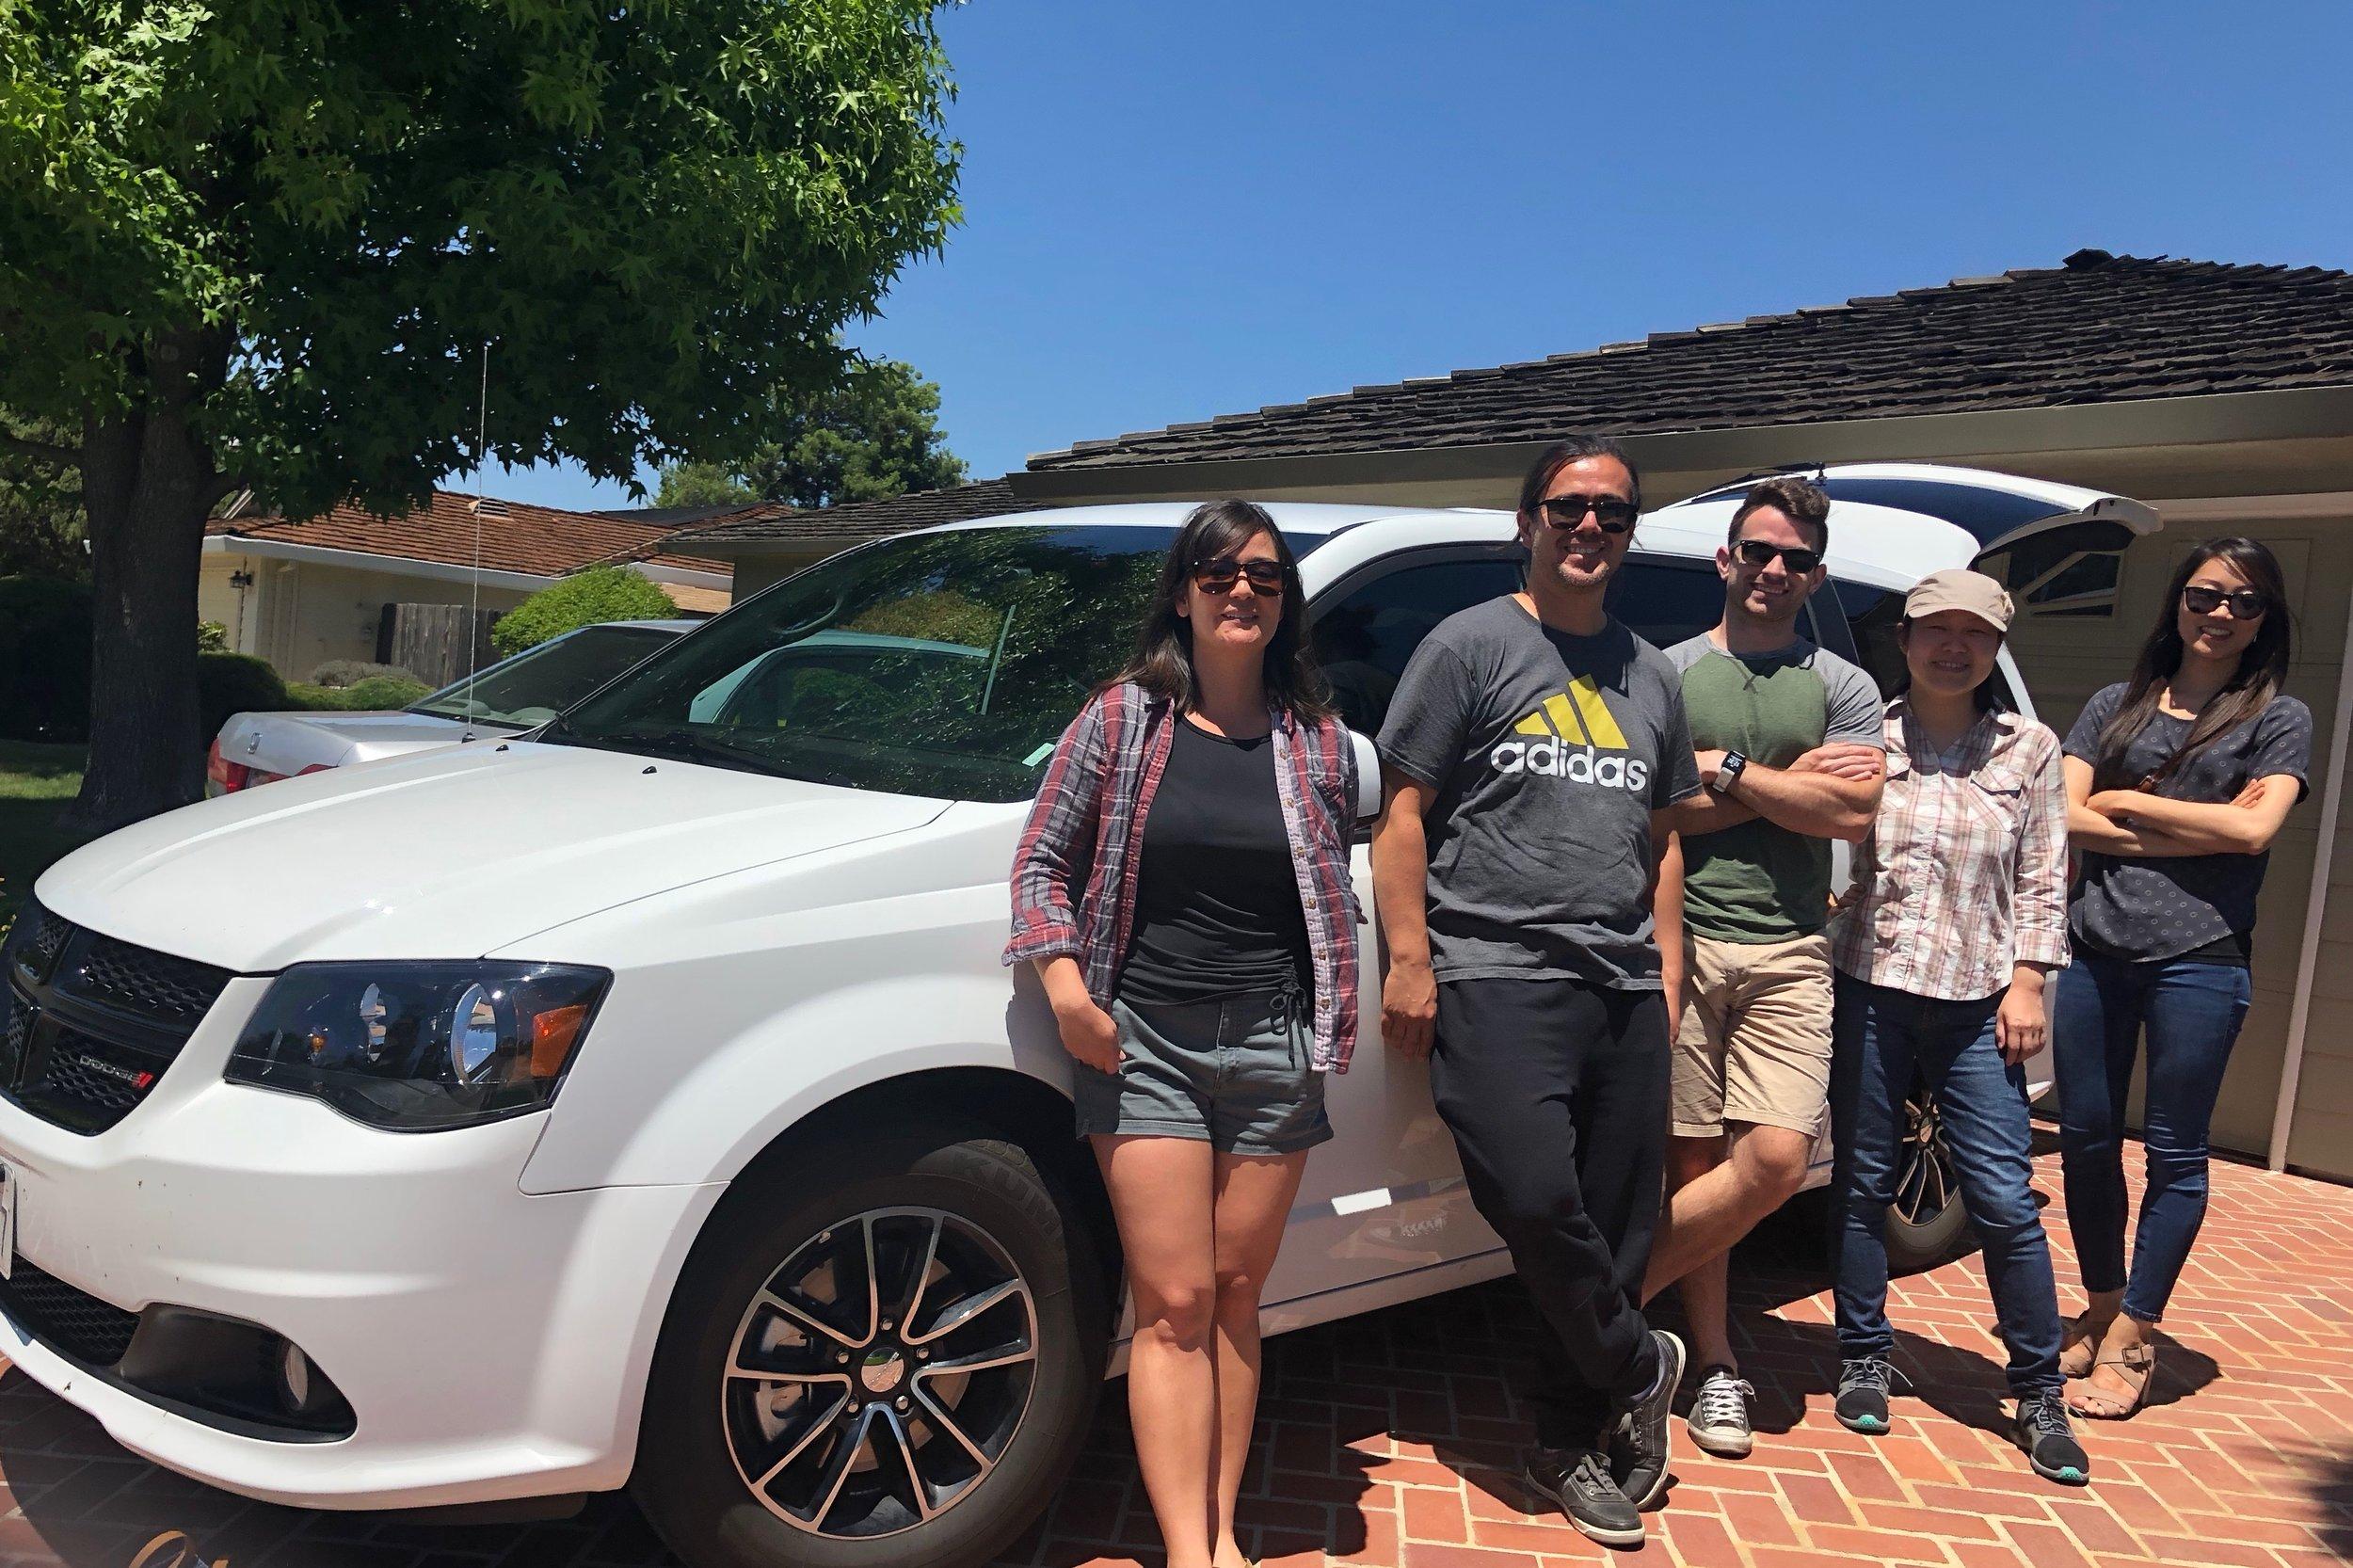 The Miura lab van on its way to RNA 2018 in Berkeley, CA.